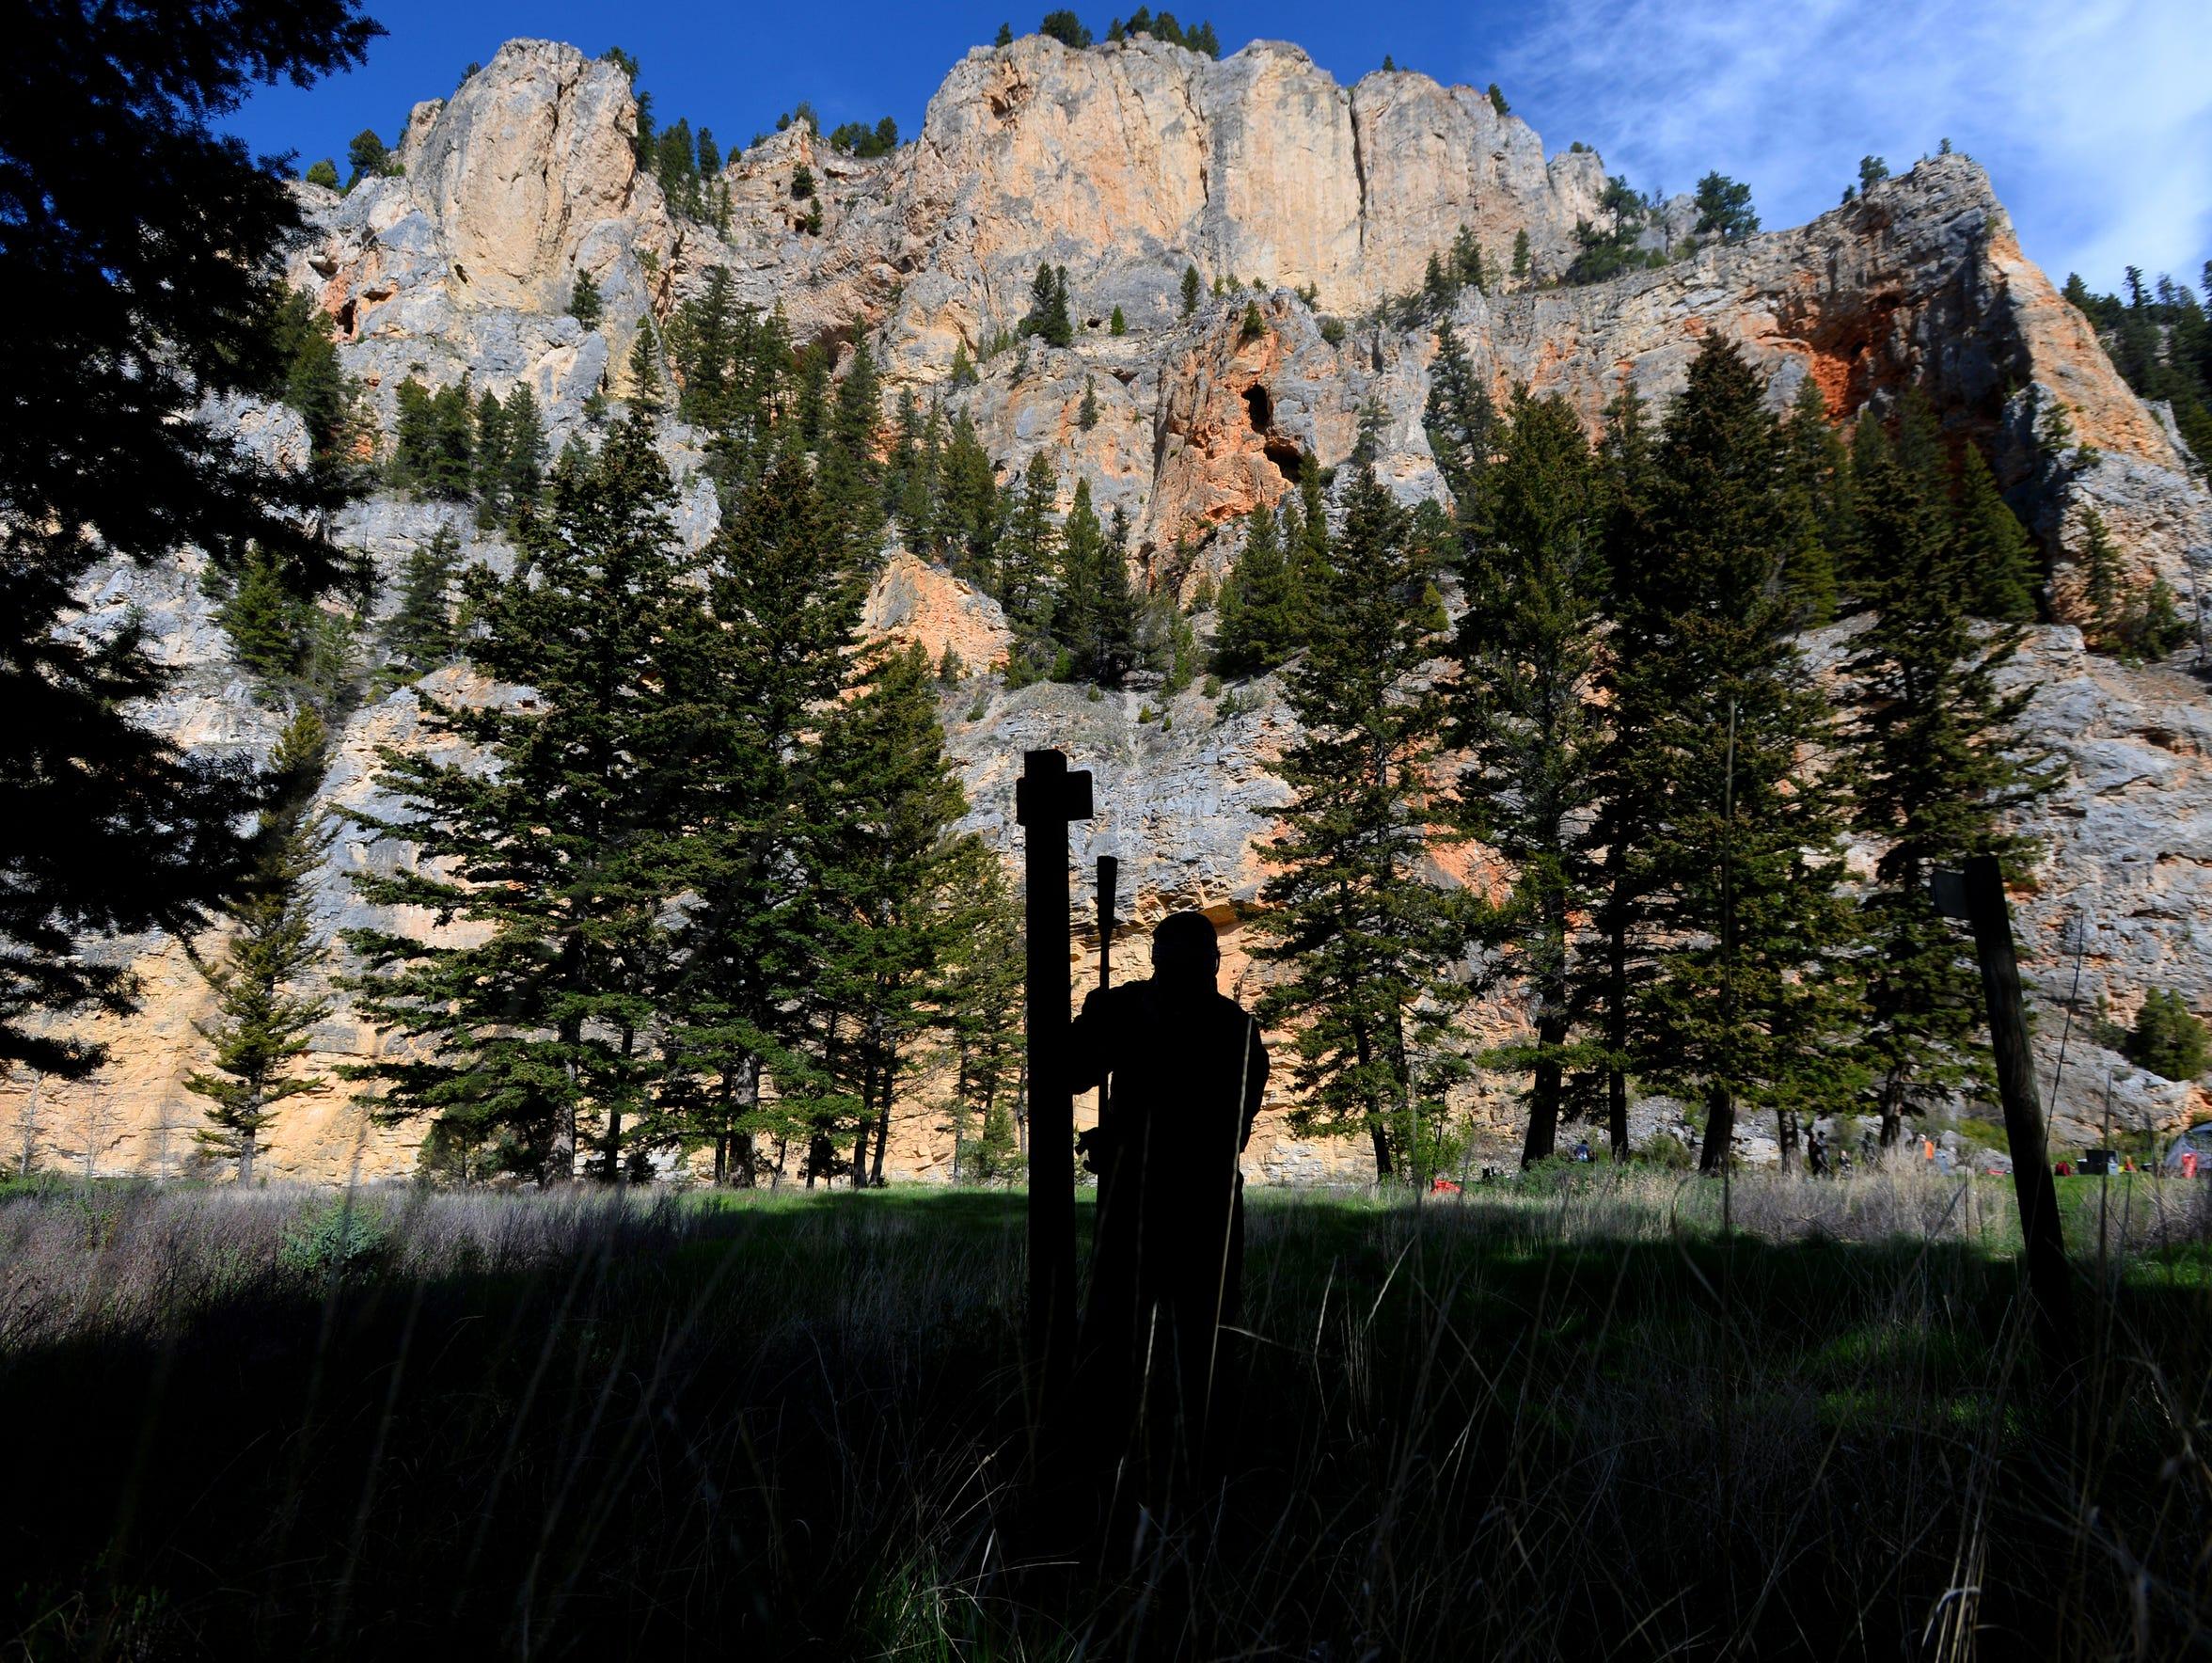 Don Mendenhall, U.S. Forest Service river ranger on